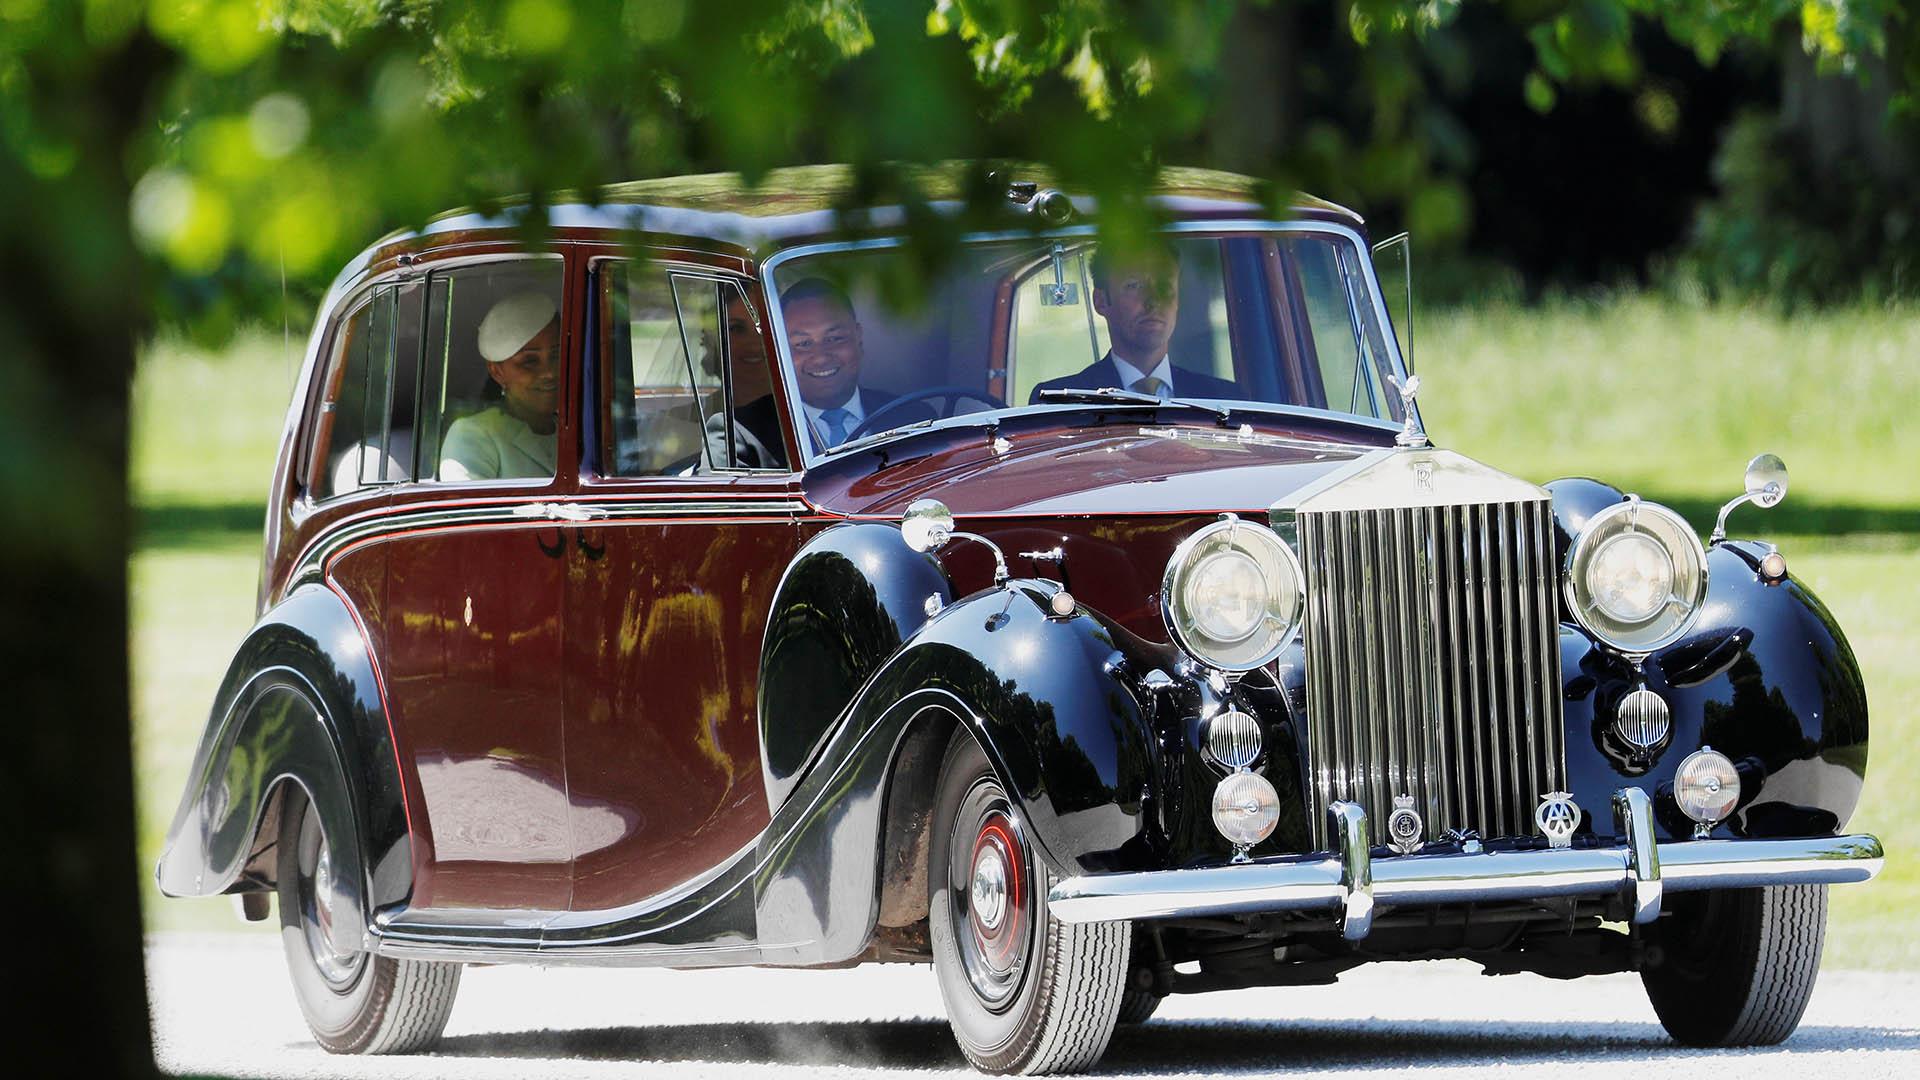 Mehgan Markle llegó en un Rolls Royce Phantom IV junto a su madre Doria Raglan (Reuters)